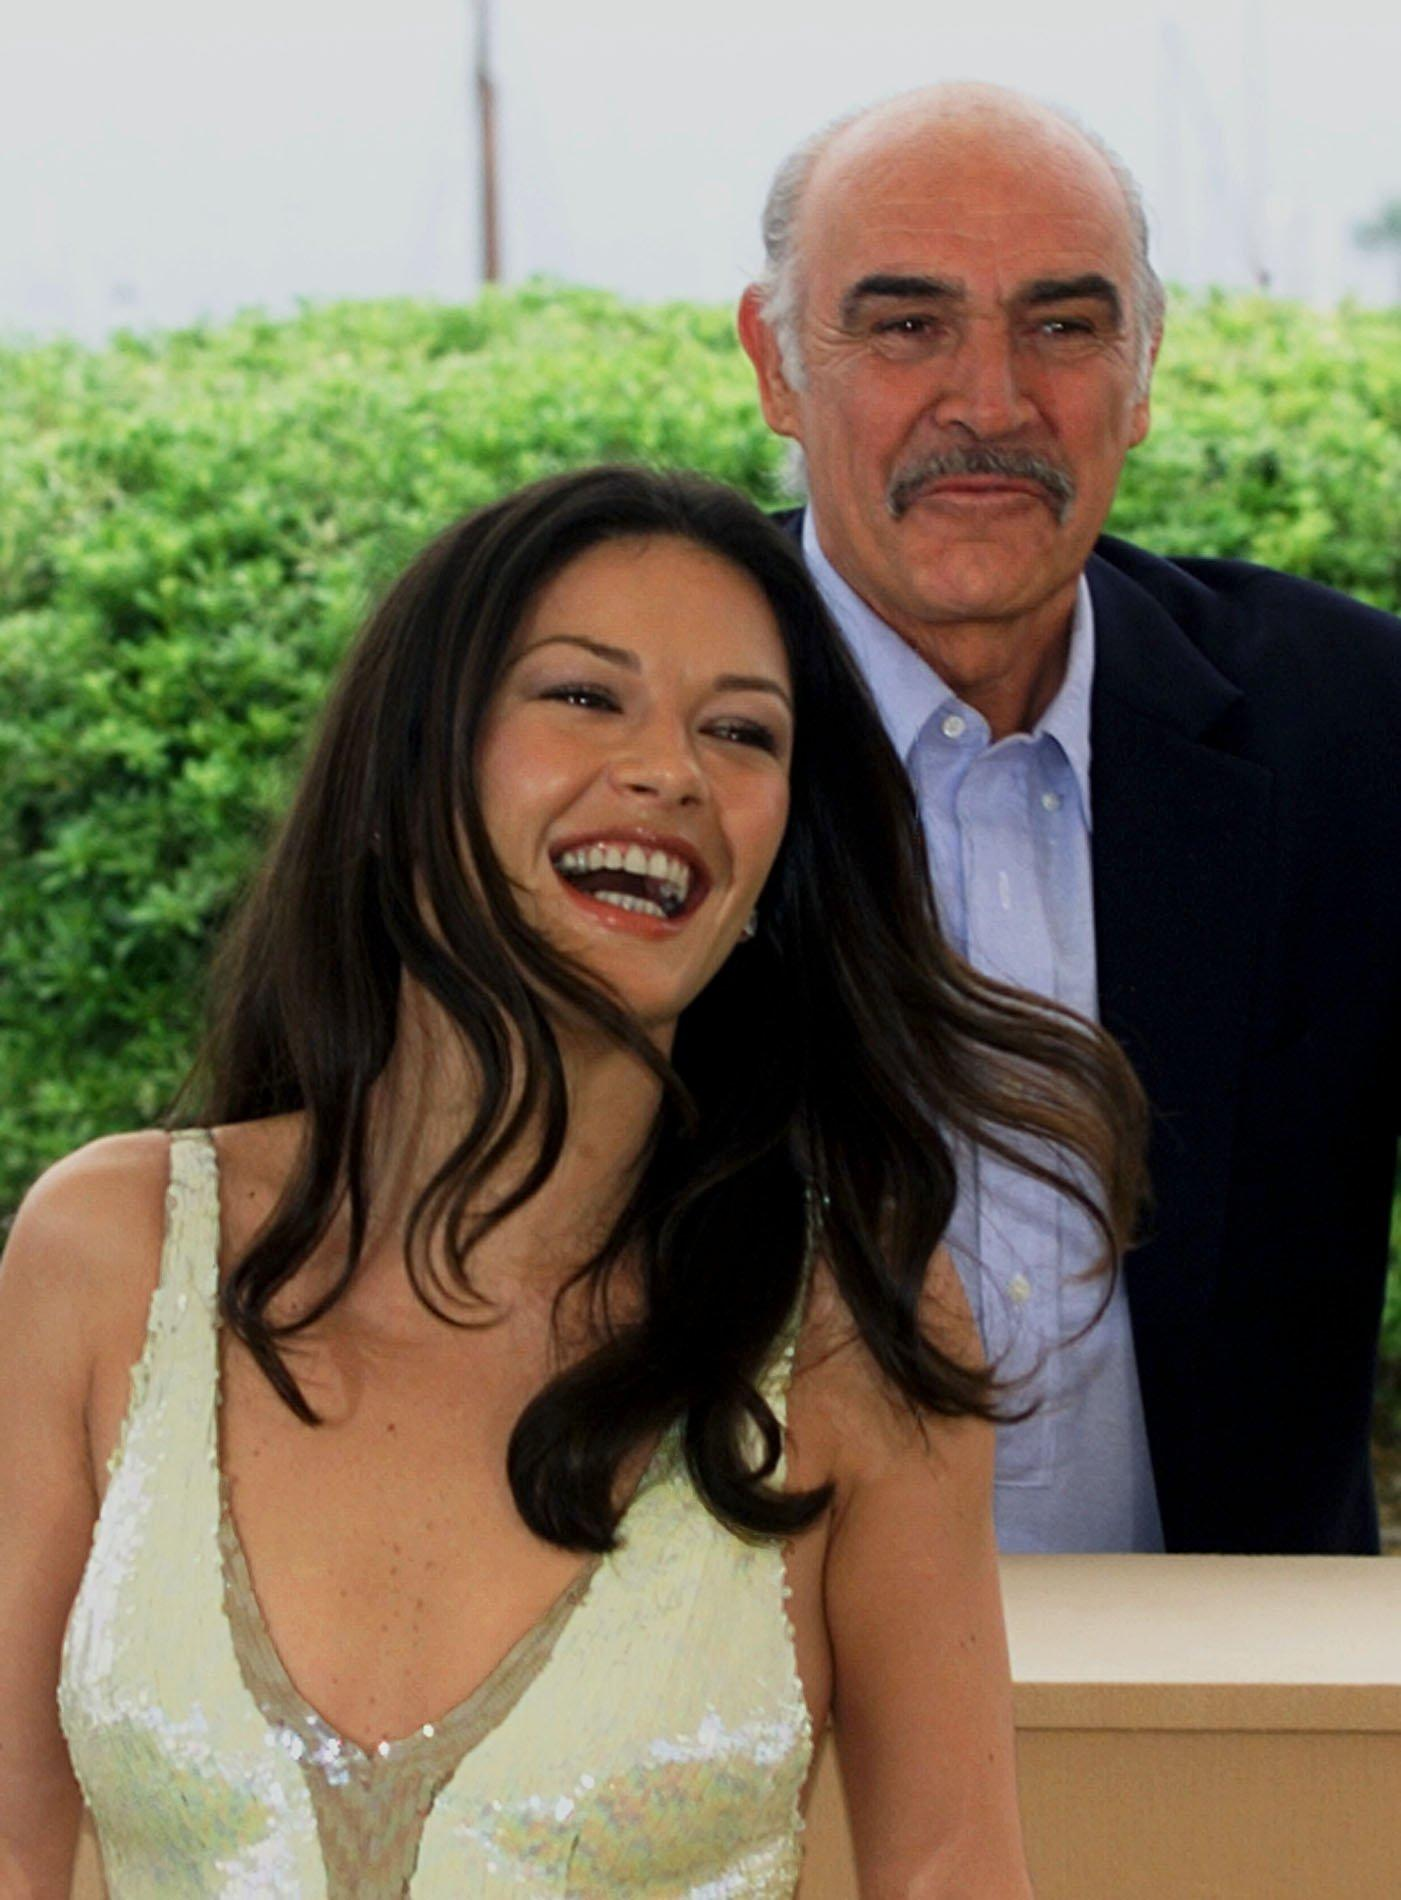 Catherine Zeta-Jones och Sean Connery på filmfestivalen i Cannes 1999.